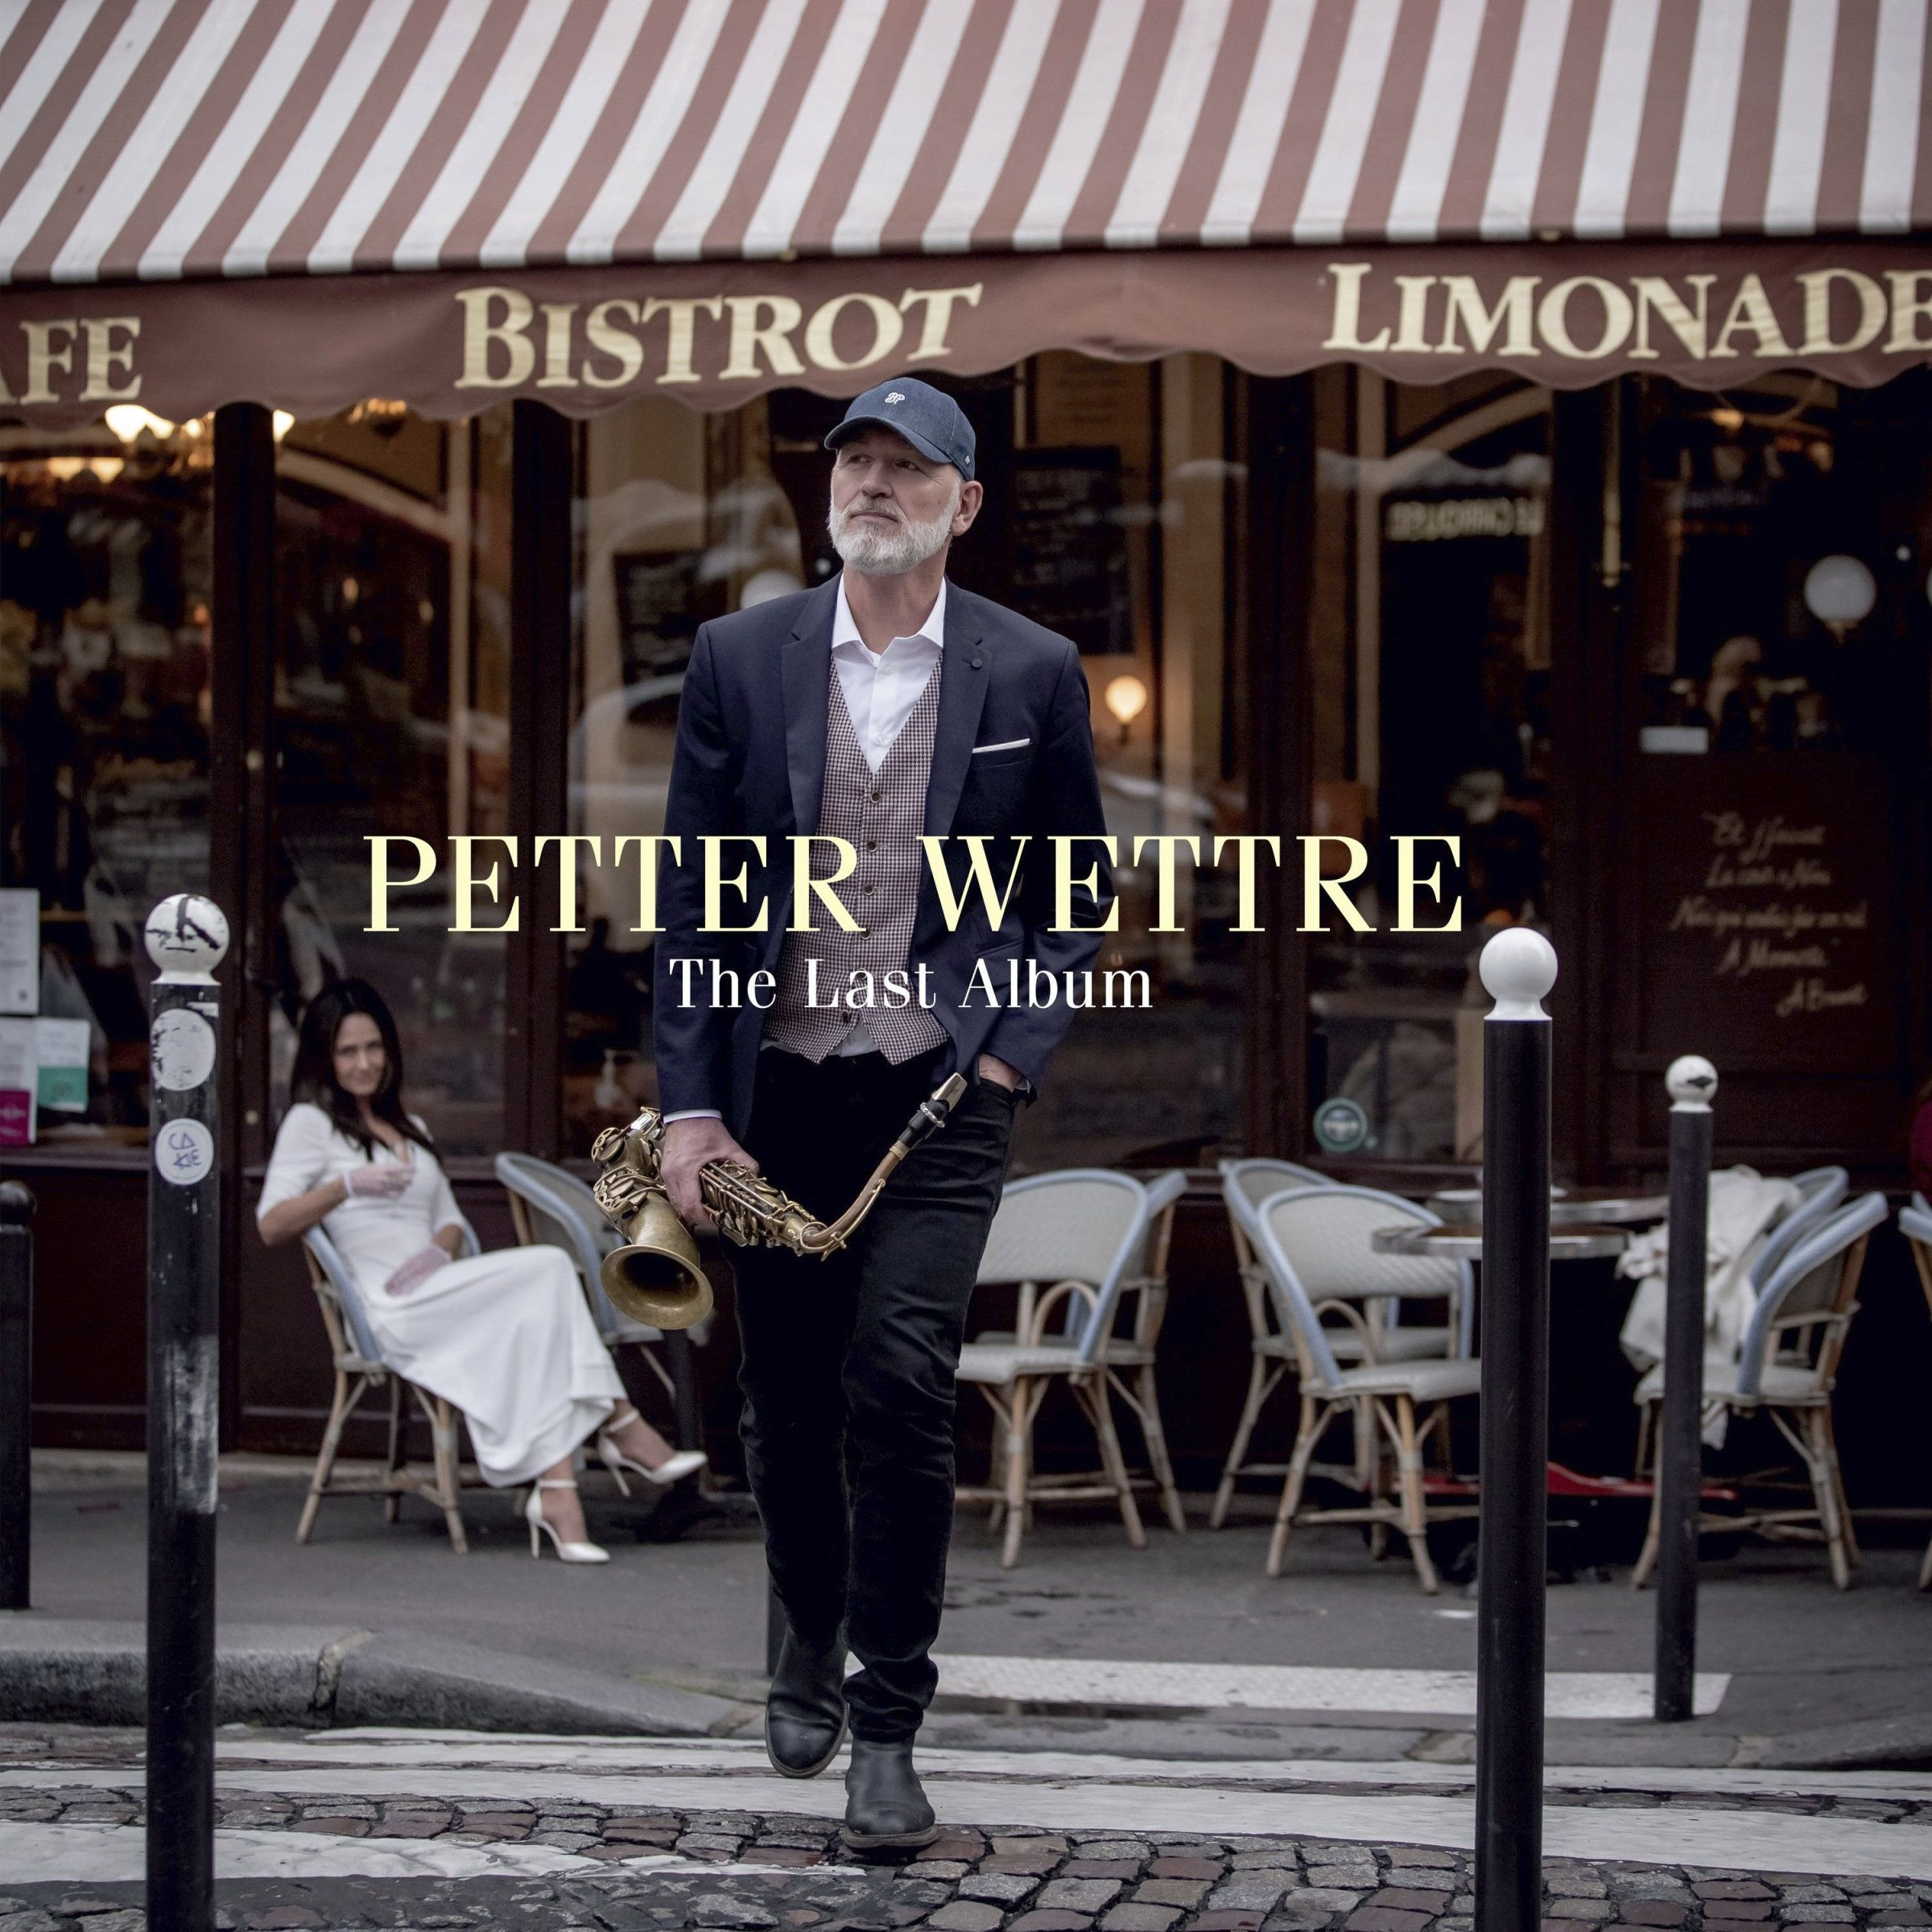 Petter Wettre